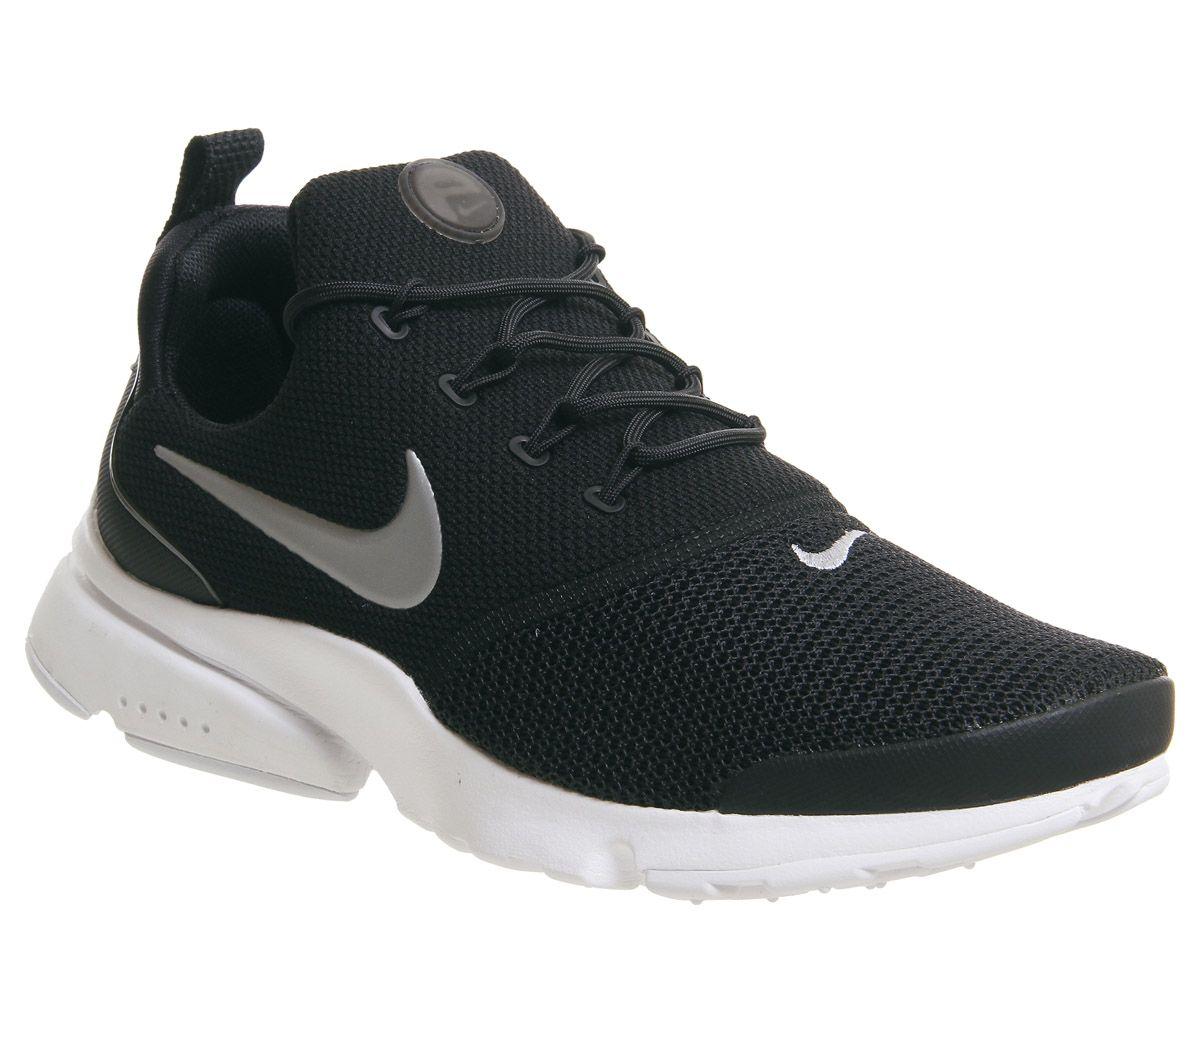 115704d15e70 Nike Presto Fly Trainers Black Metallic Silver White F - Hers trainers